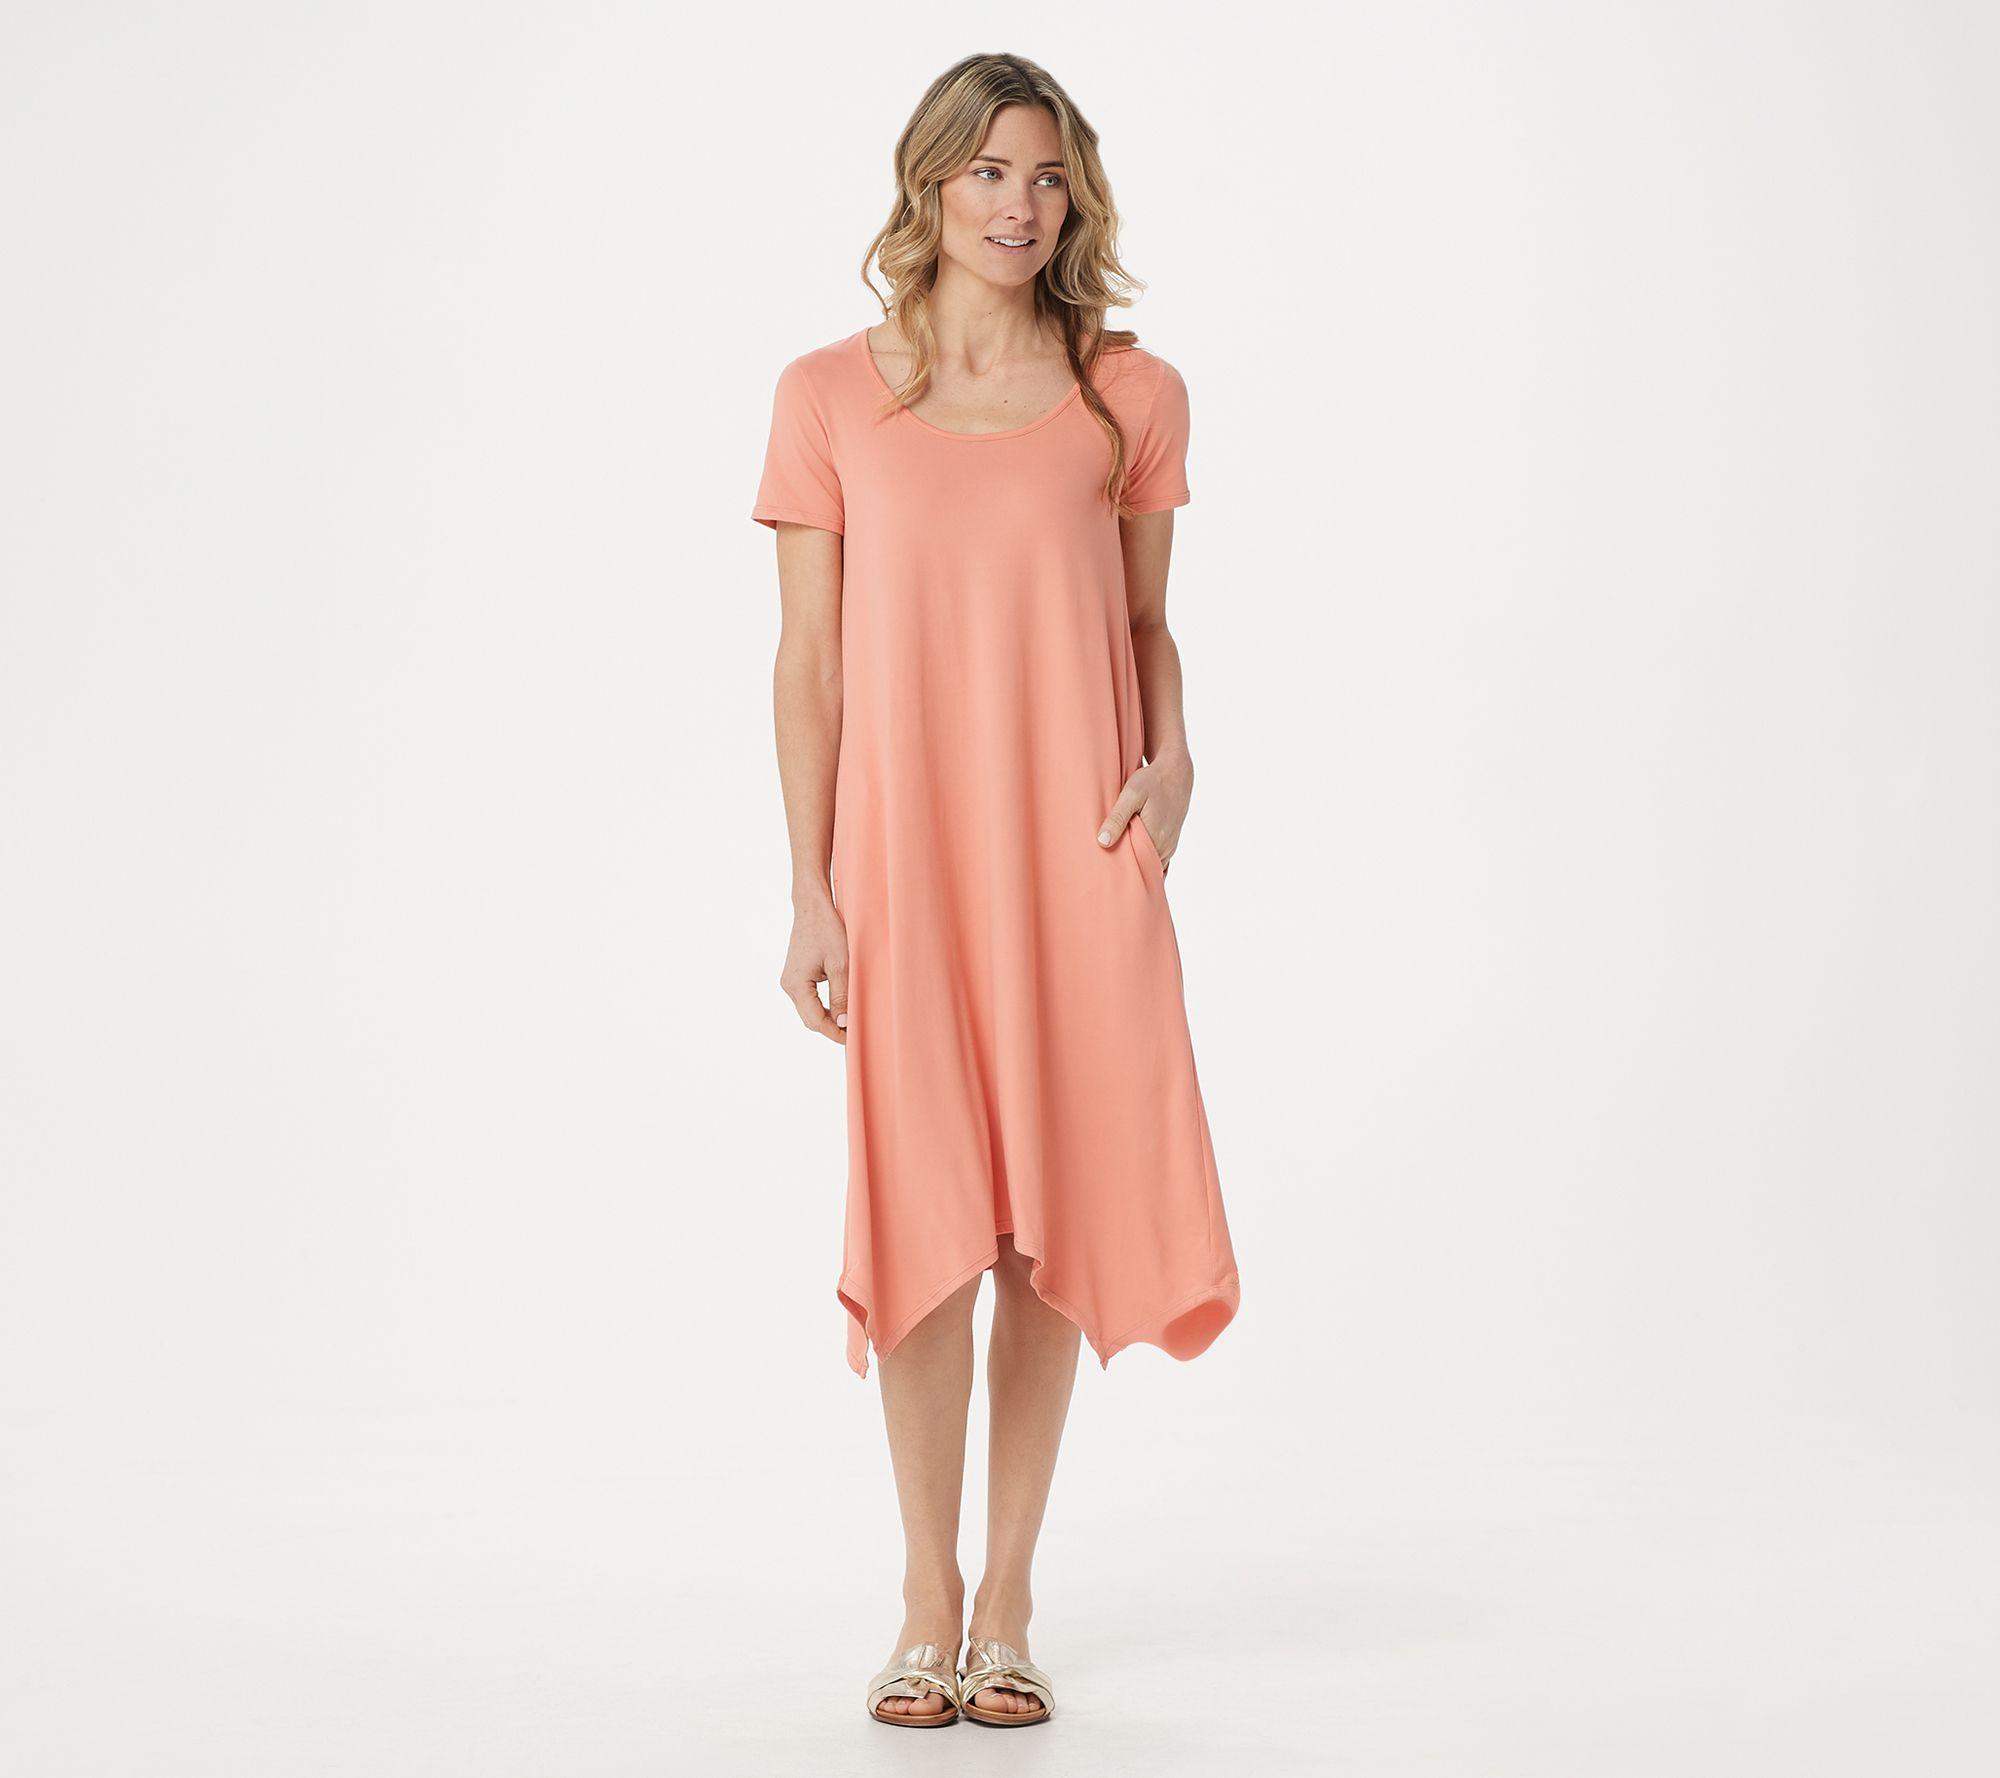 1ee6dce2e4f3 Cuddl Duds Flexwear Petite Handkerchief Hem Dress - Page 1 — QVC.com